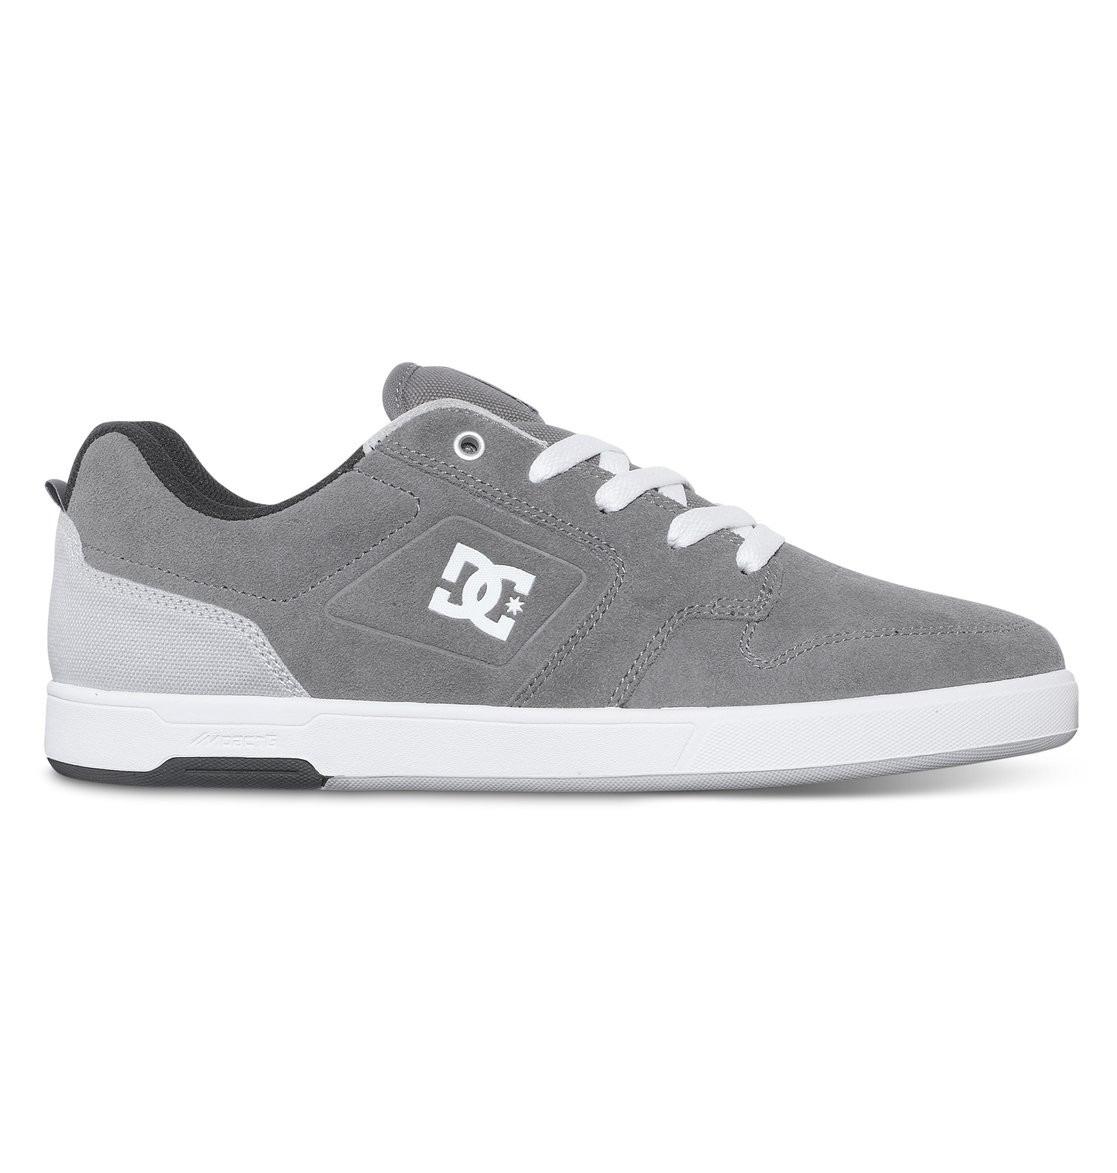 95f4e9bc3a tênis dc shoes nyjah huston s m shoes. Carregando zoom.